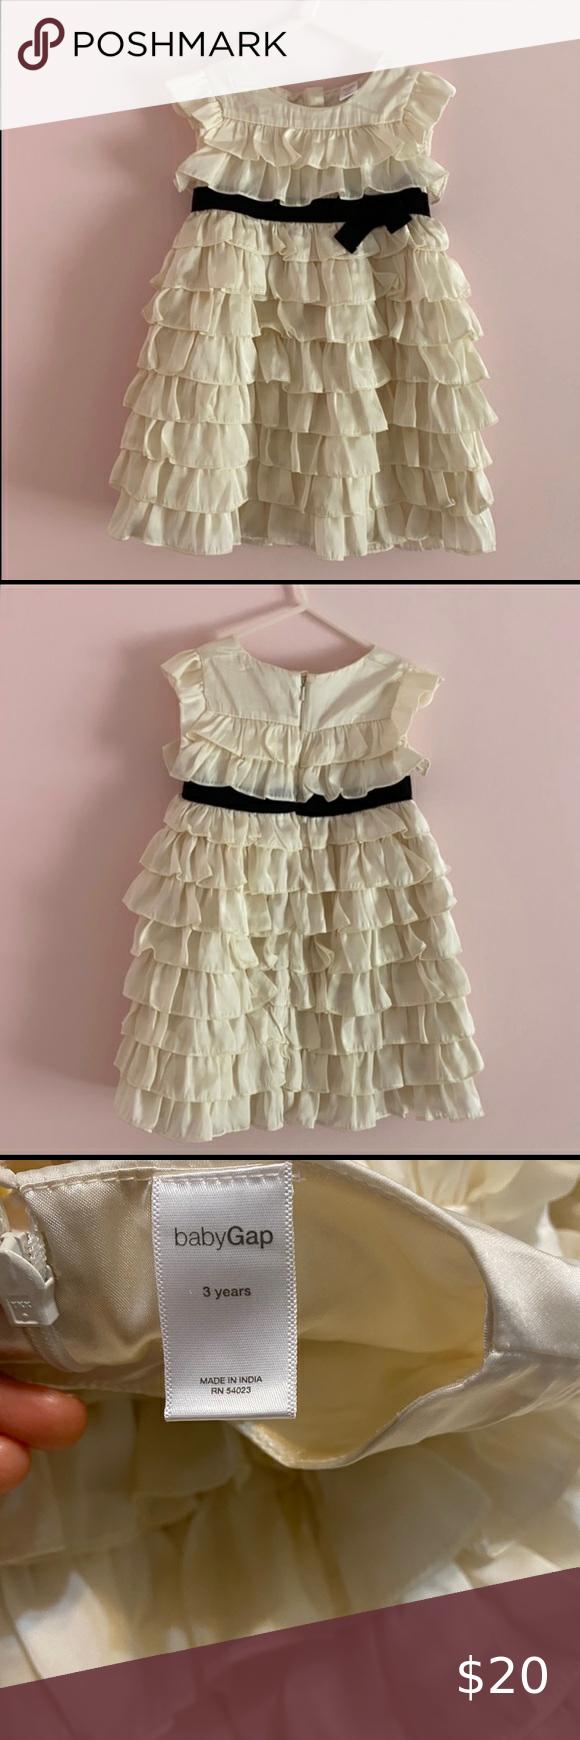 Babygap Ivory Ruffled Dress Black Ribbon Trim 3t Blush Pink Lace Dress Girls Velvet Dress Girls Sequin Dress [ 1740 x 580 Pixel ]